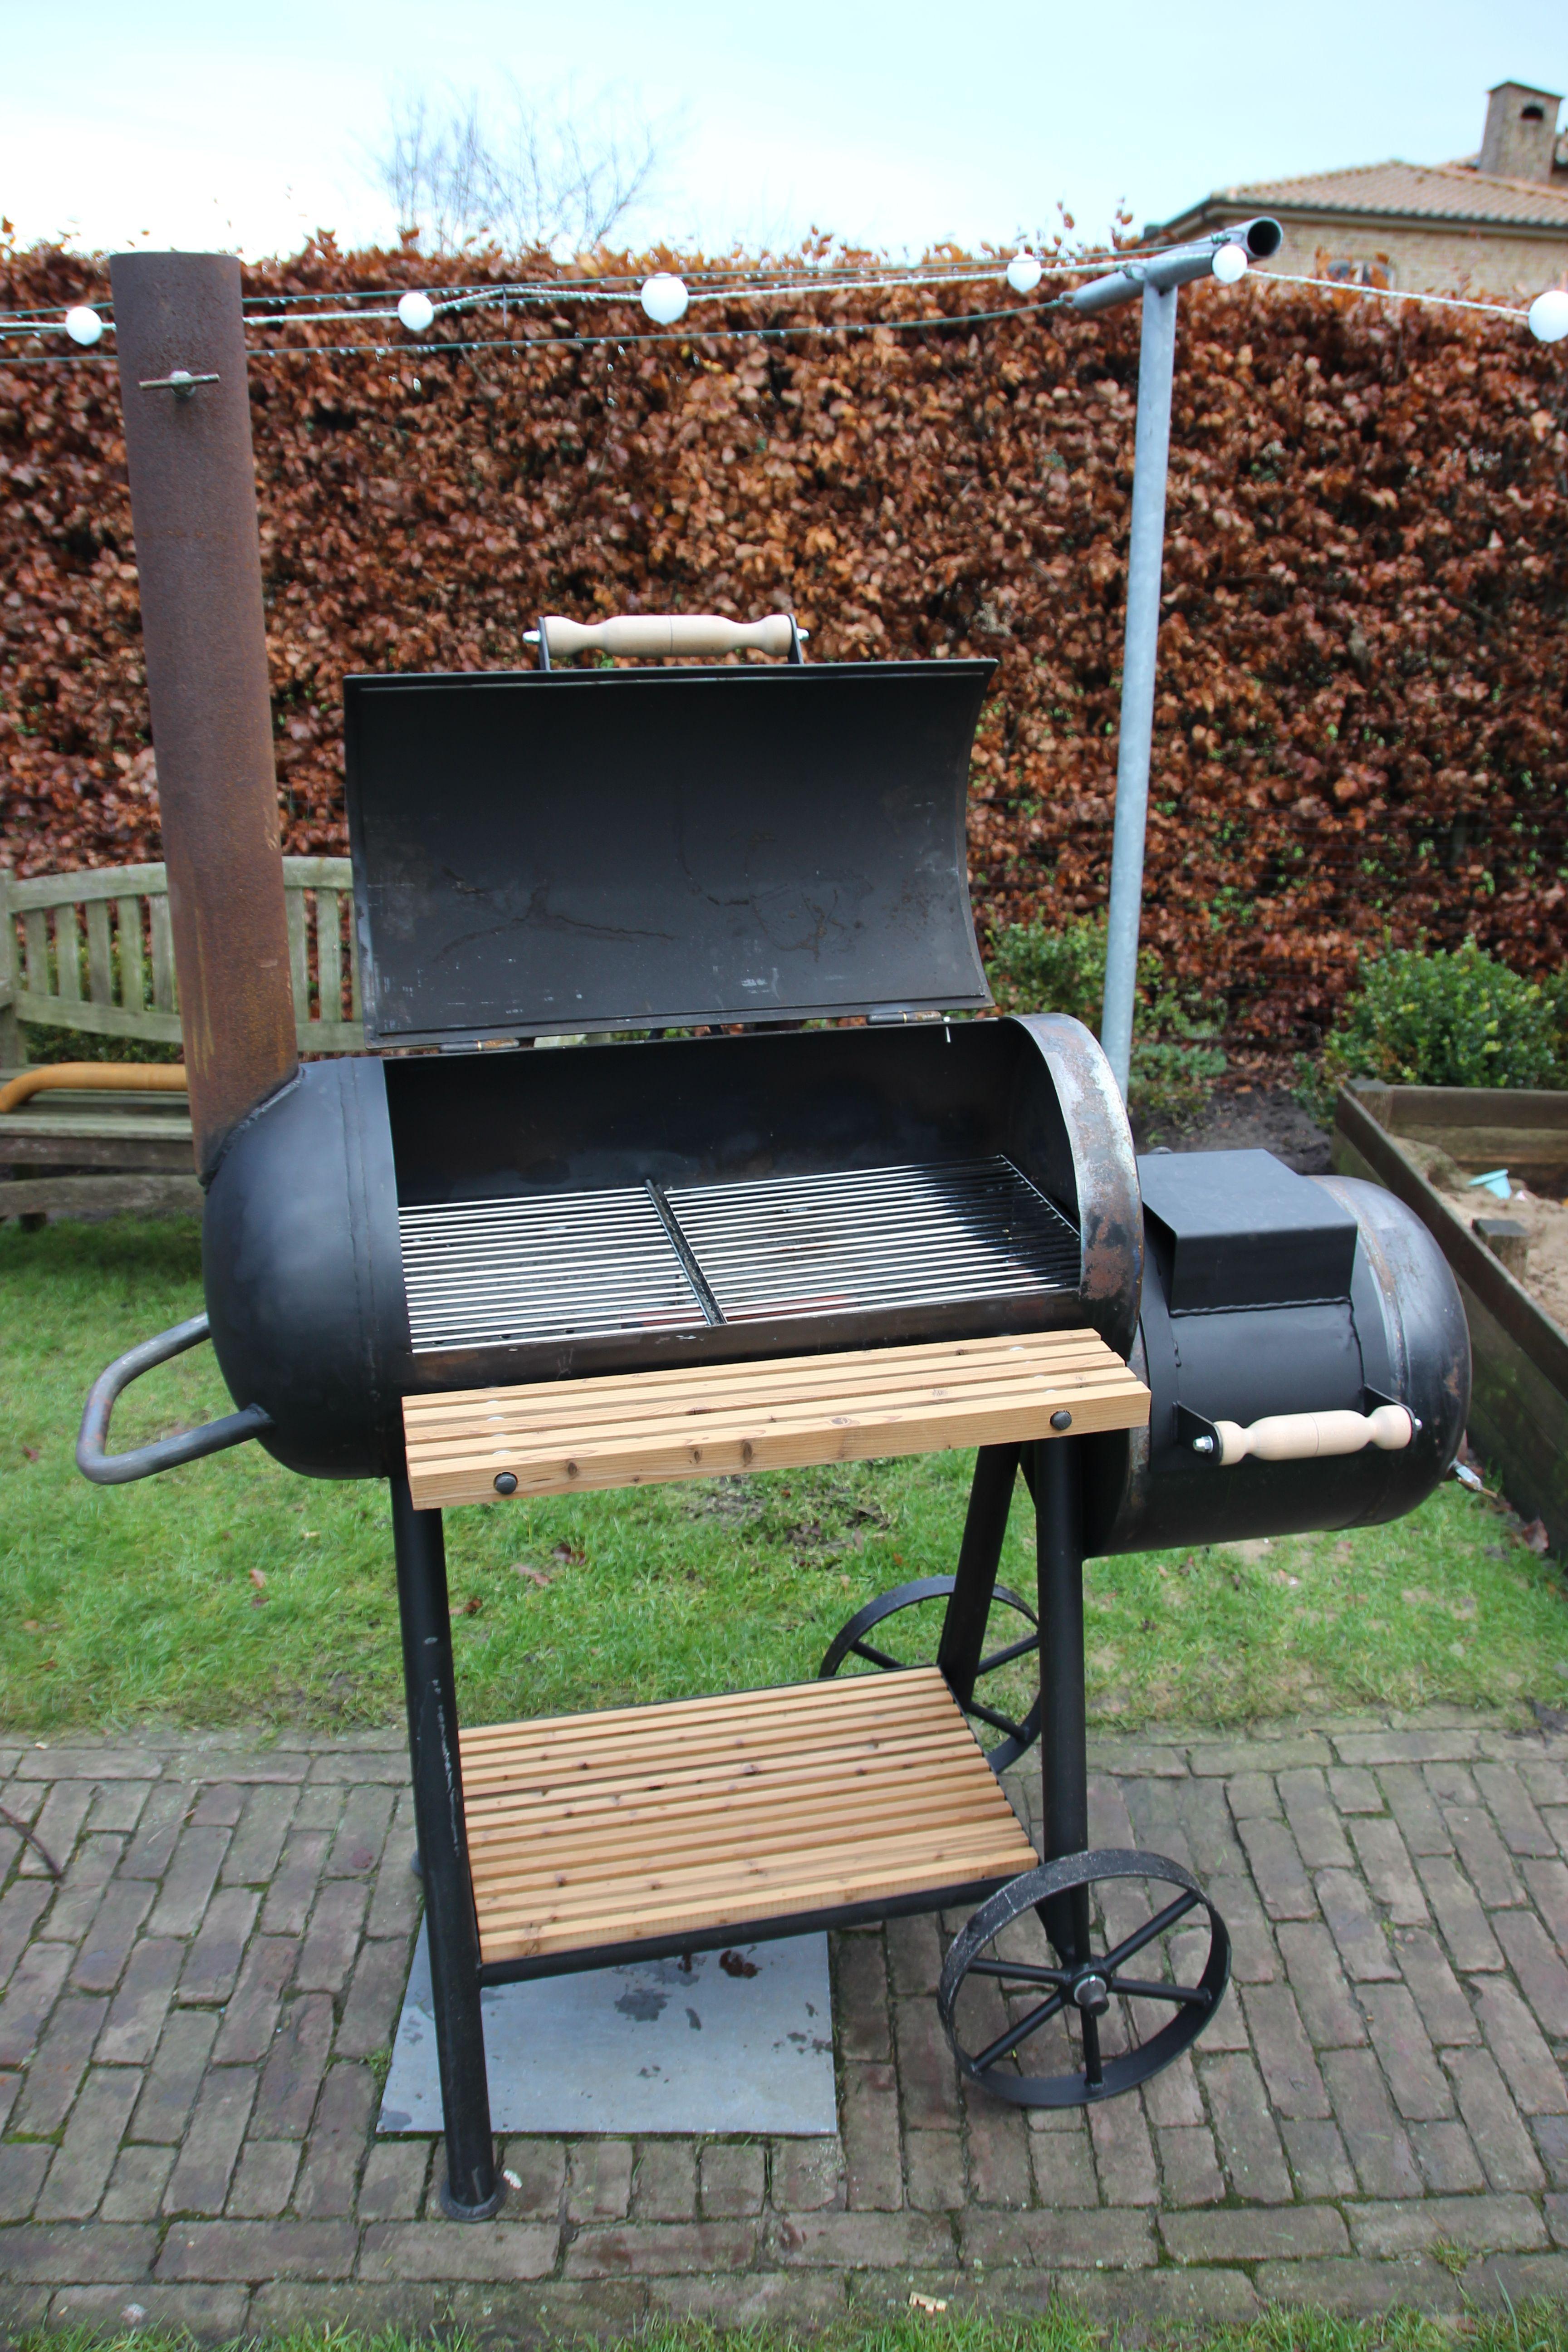 Diy Bbq Lpg Tank Bbq Grill Design Diy Bbq Backyard Grilling